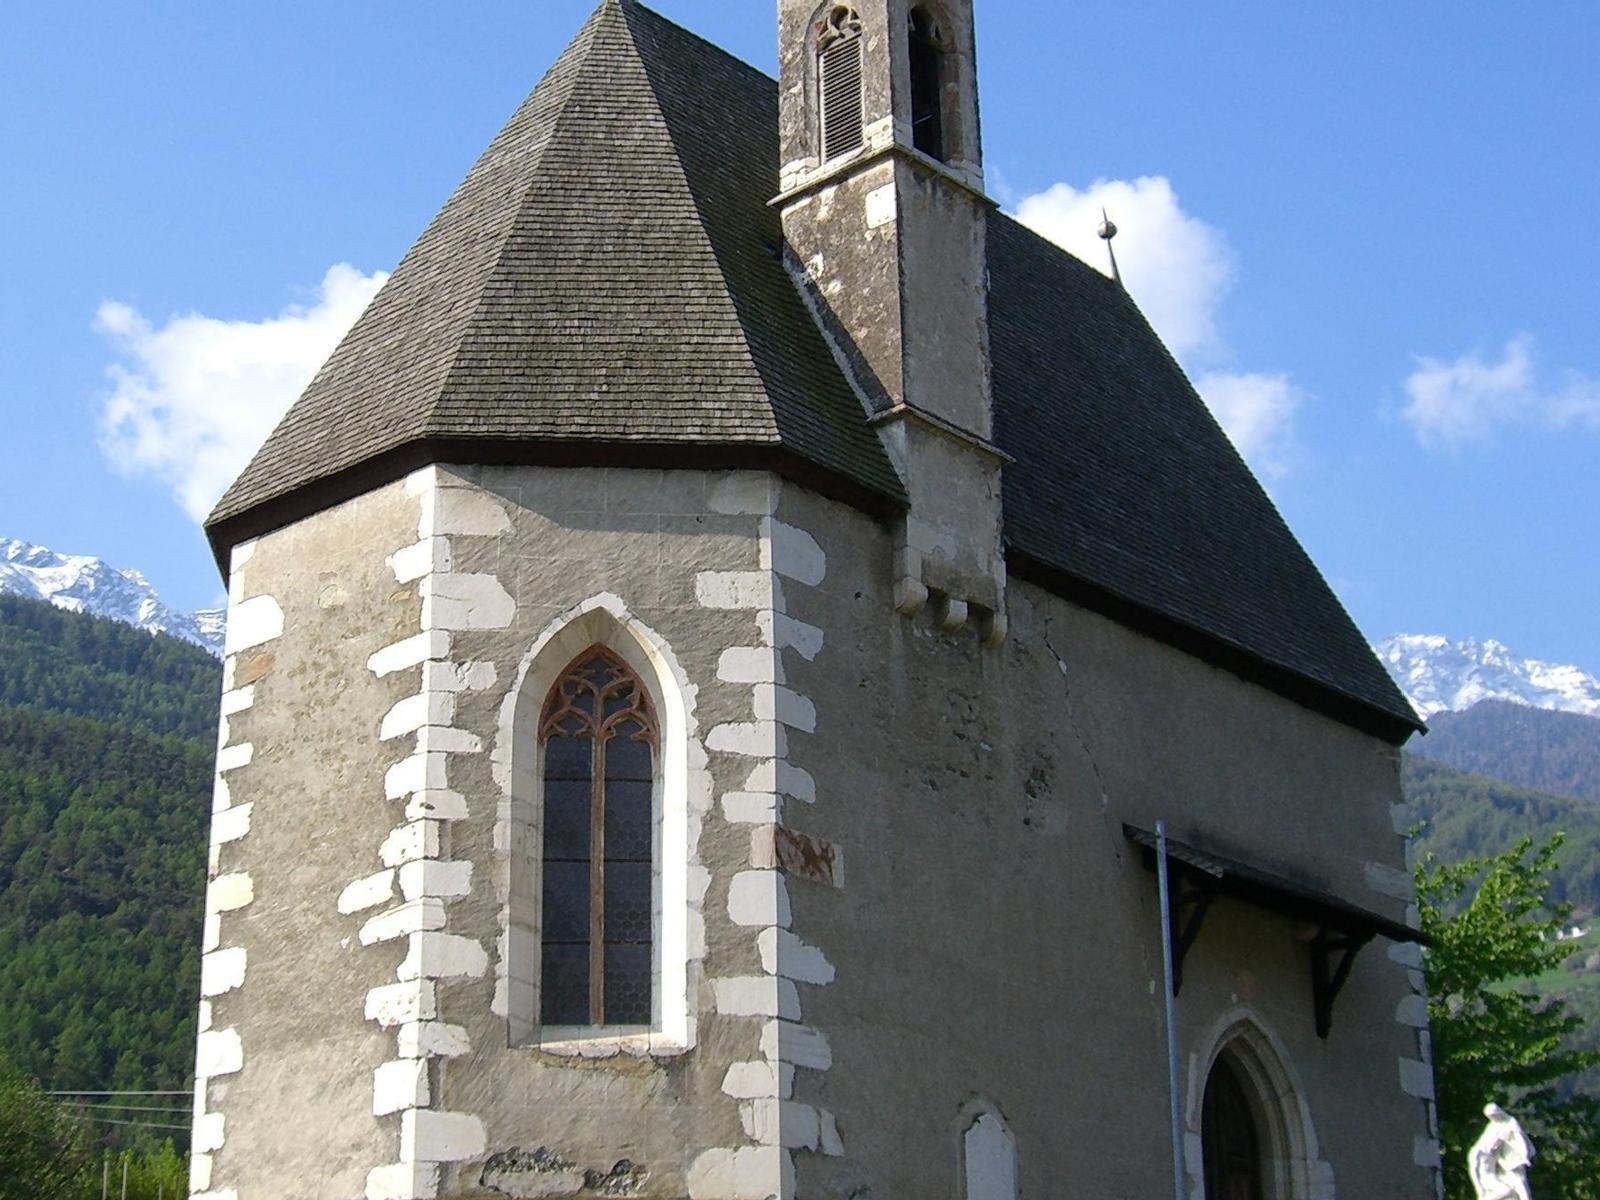 St. Walpurgis Kirche, Göflan